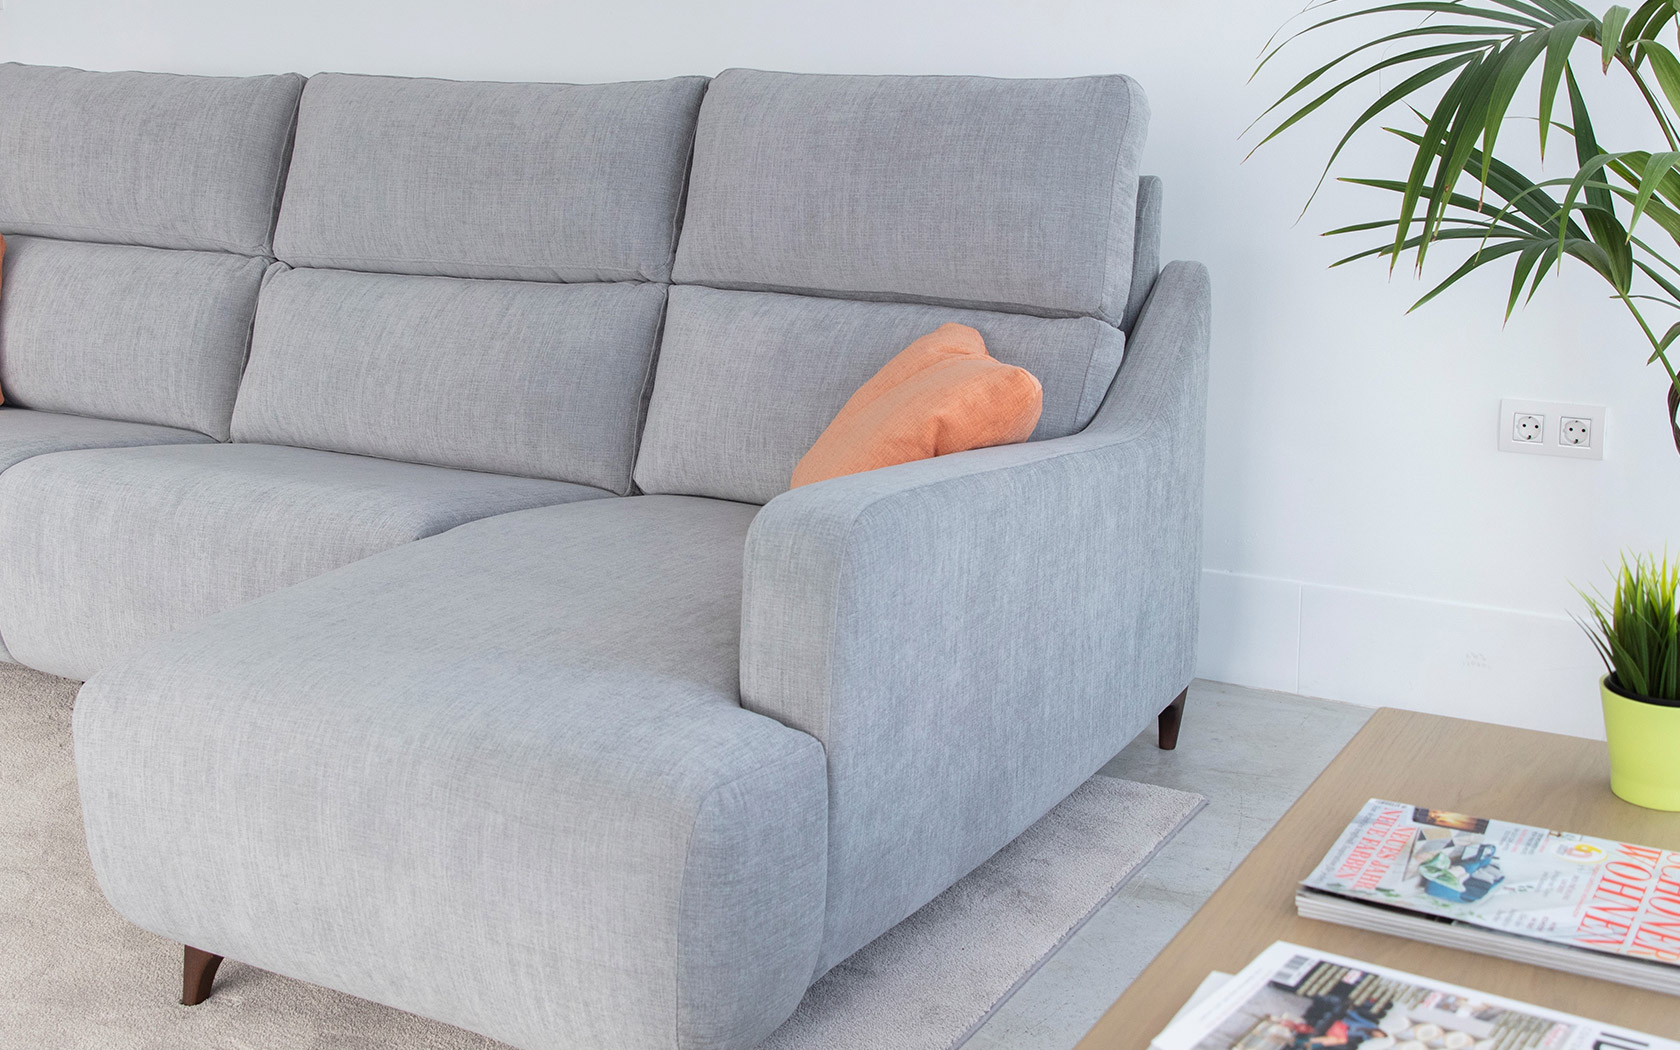 axel sofa 2021 10